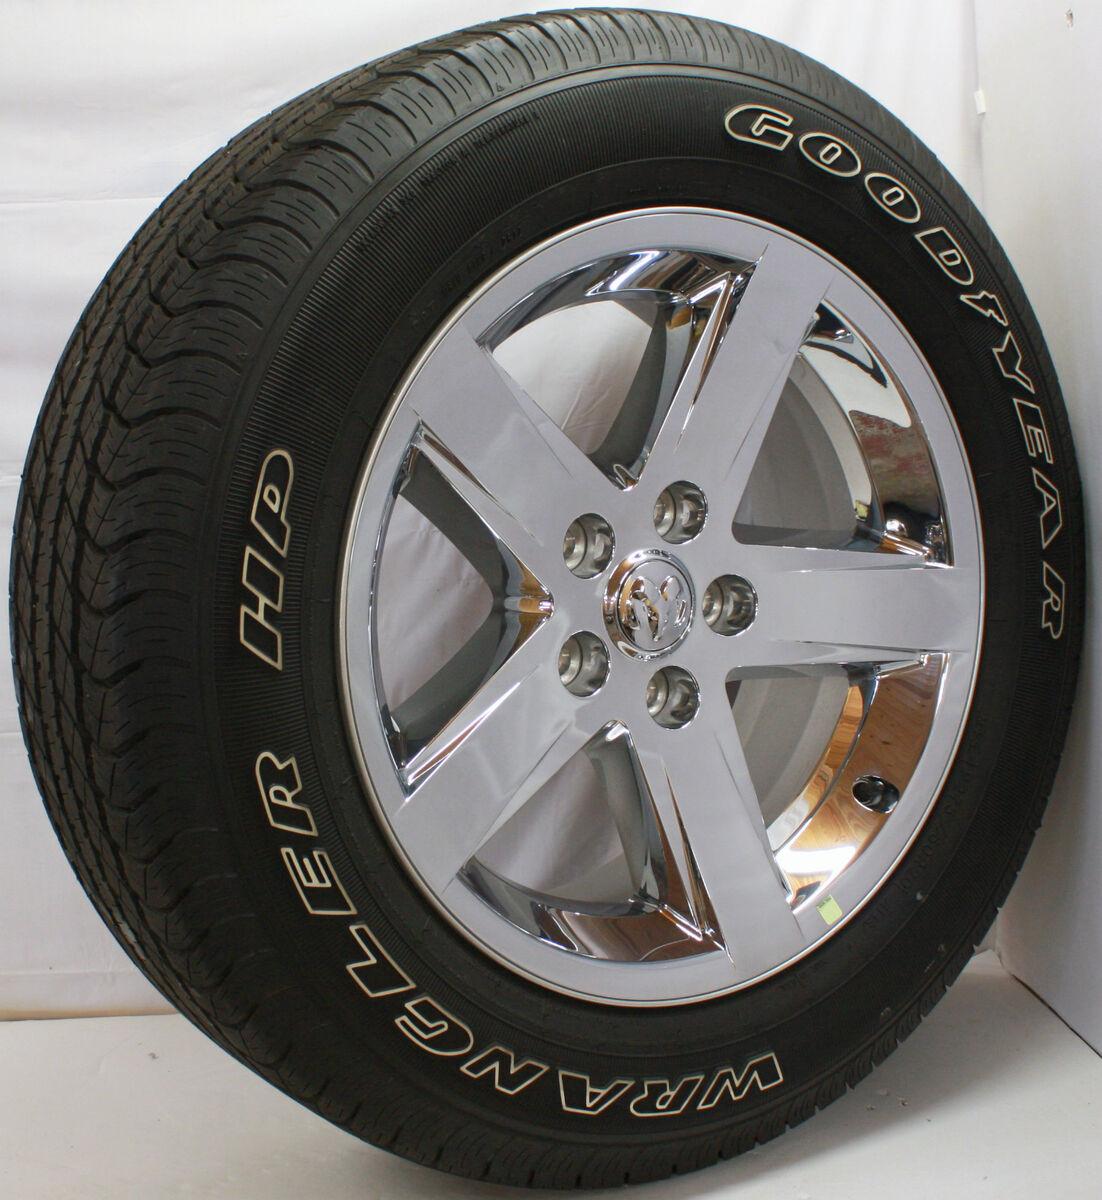 "New Set 4 2013 Dodge RAM 1500 Chrome Clad 20"" Wheels Rims Goodyear Tires"